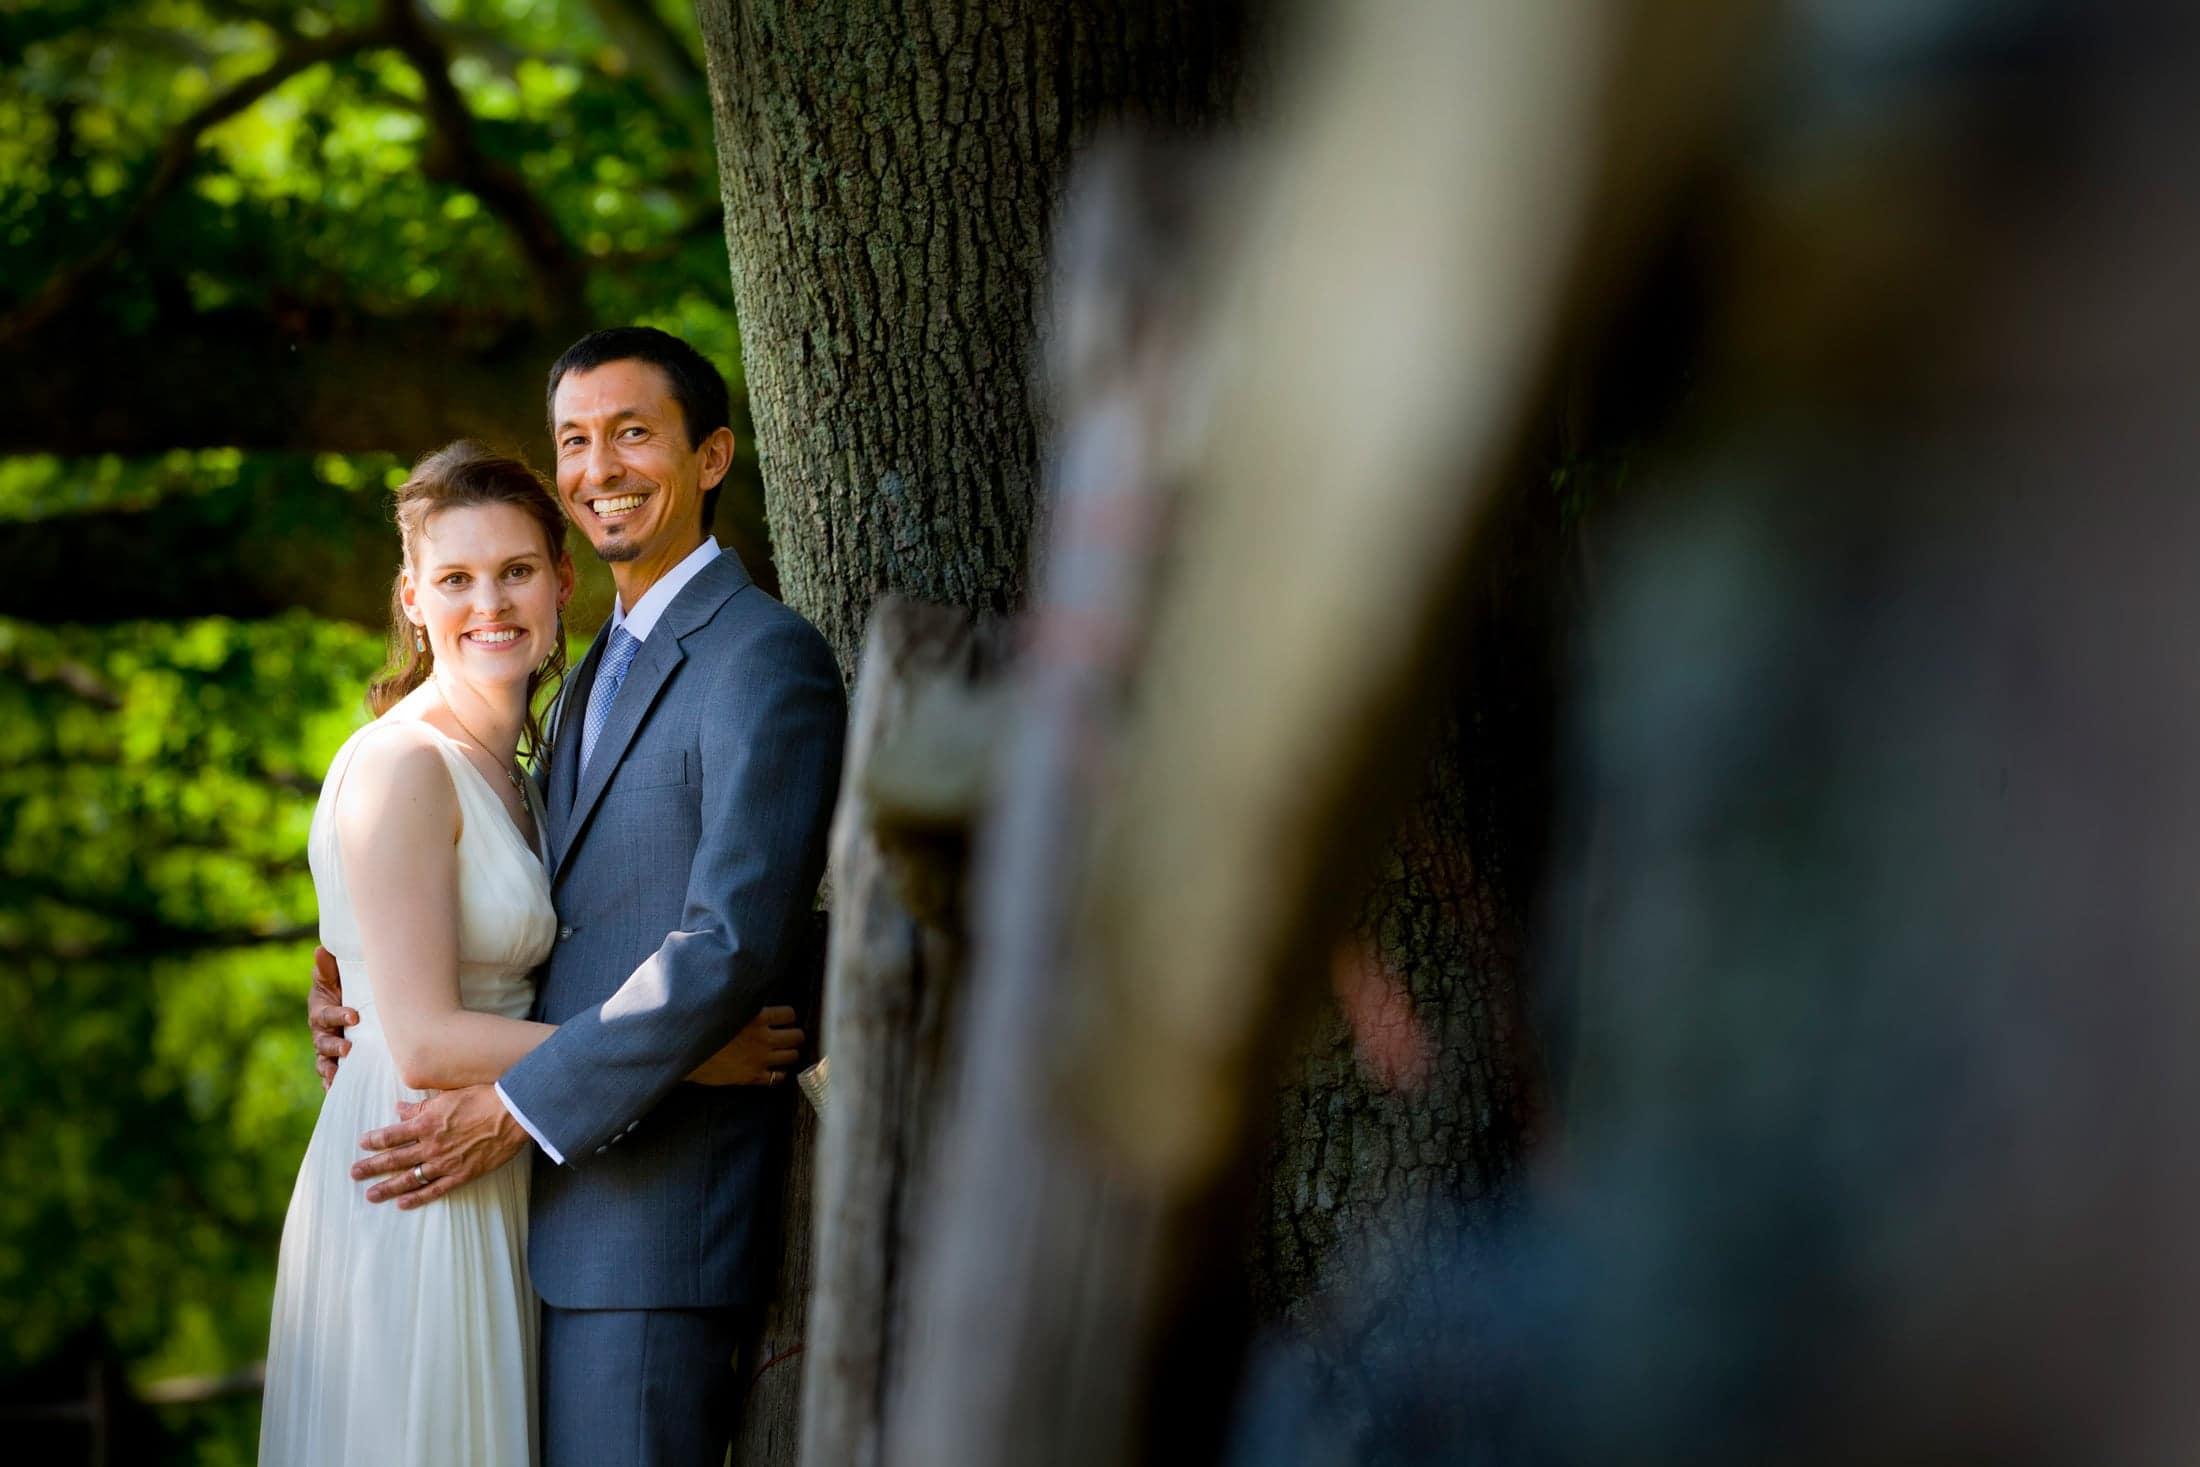 Sussex wedding photographer | Antonia + John